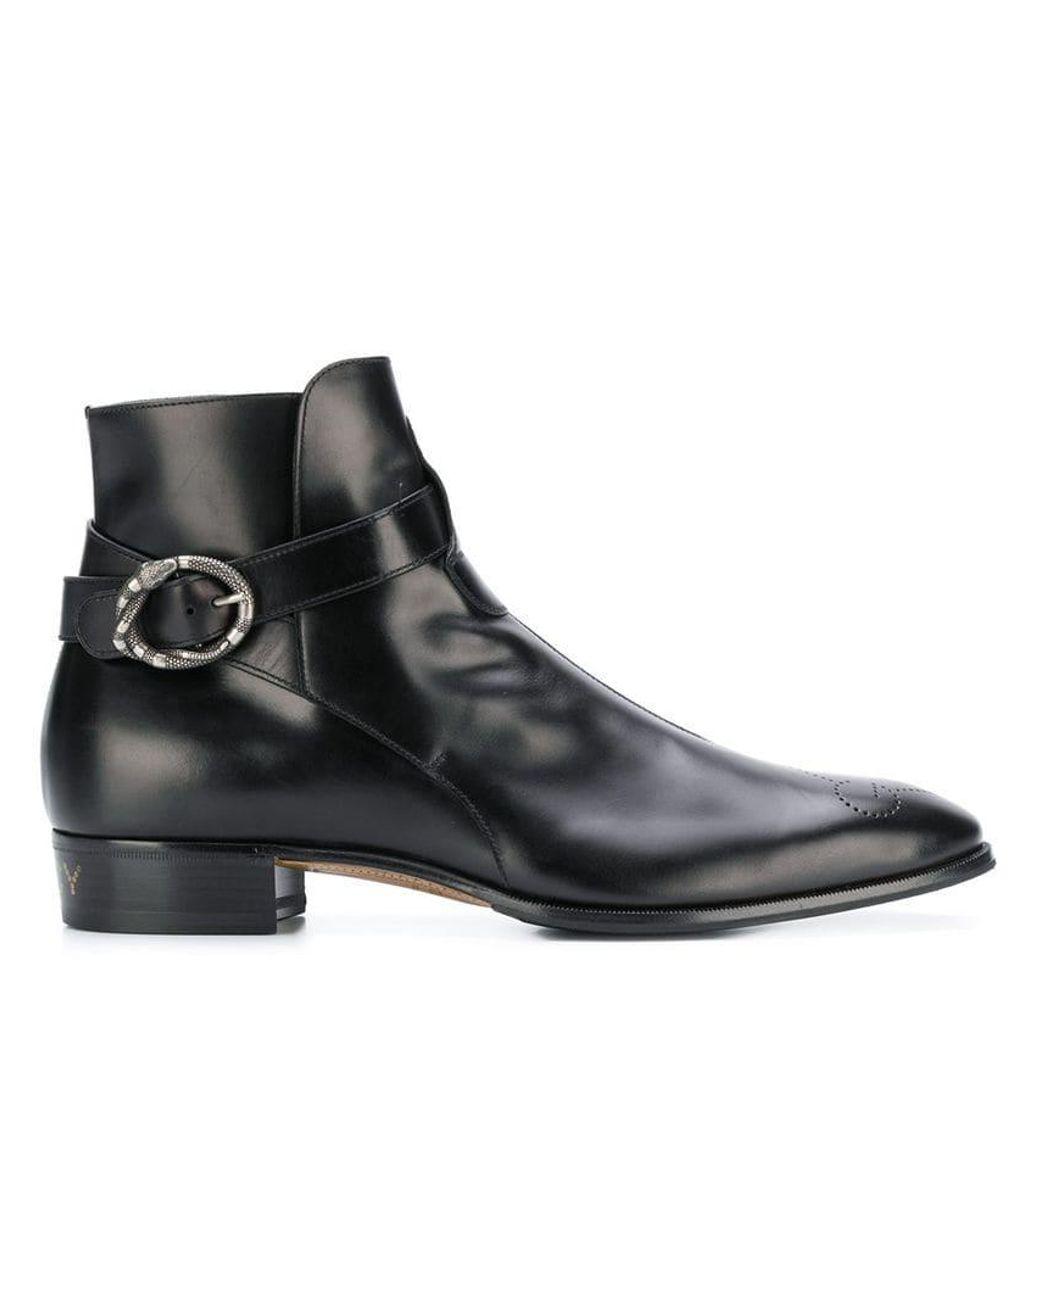 a8ea3e44101 Gucci Guccy Plata Boots in Black for Men - Lyst